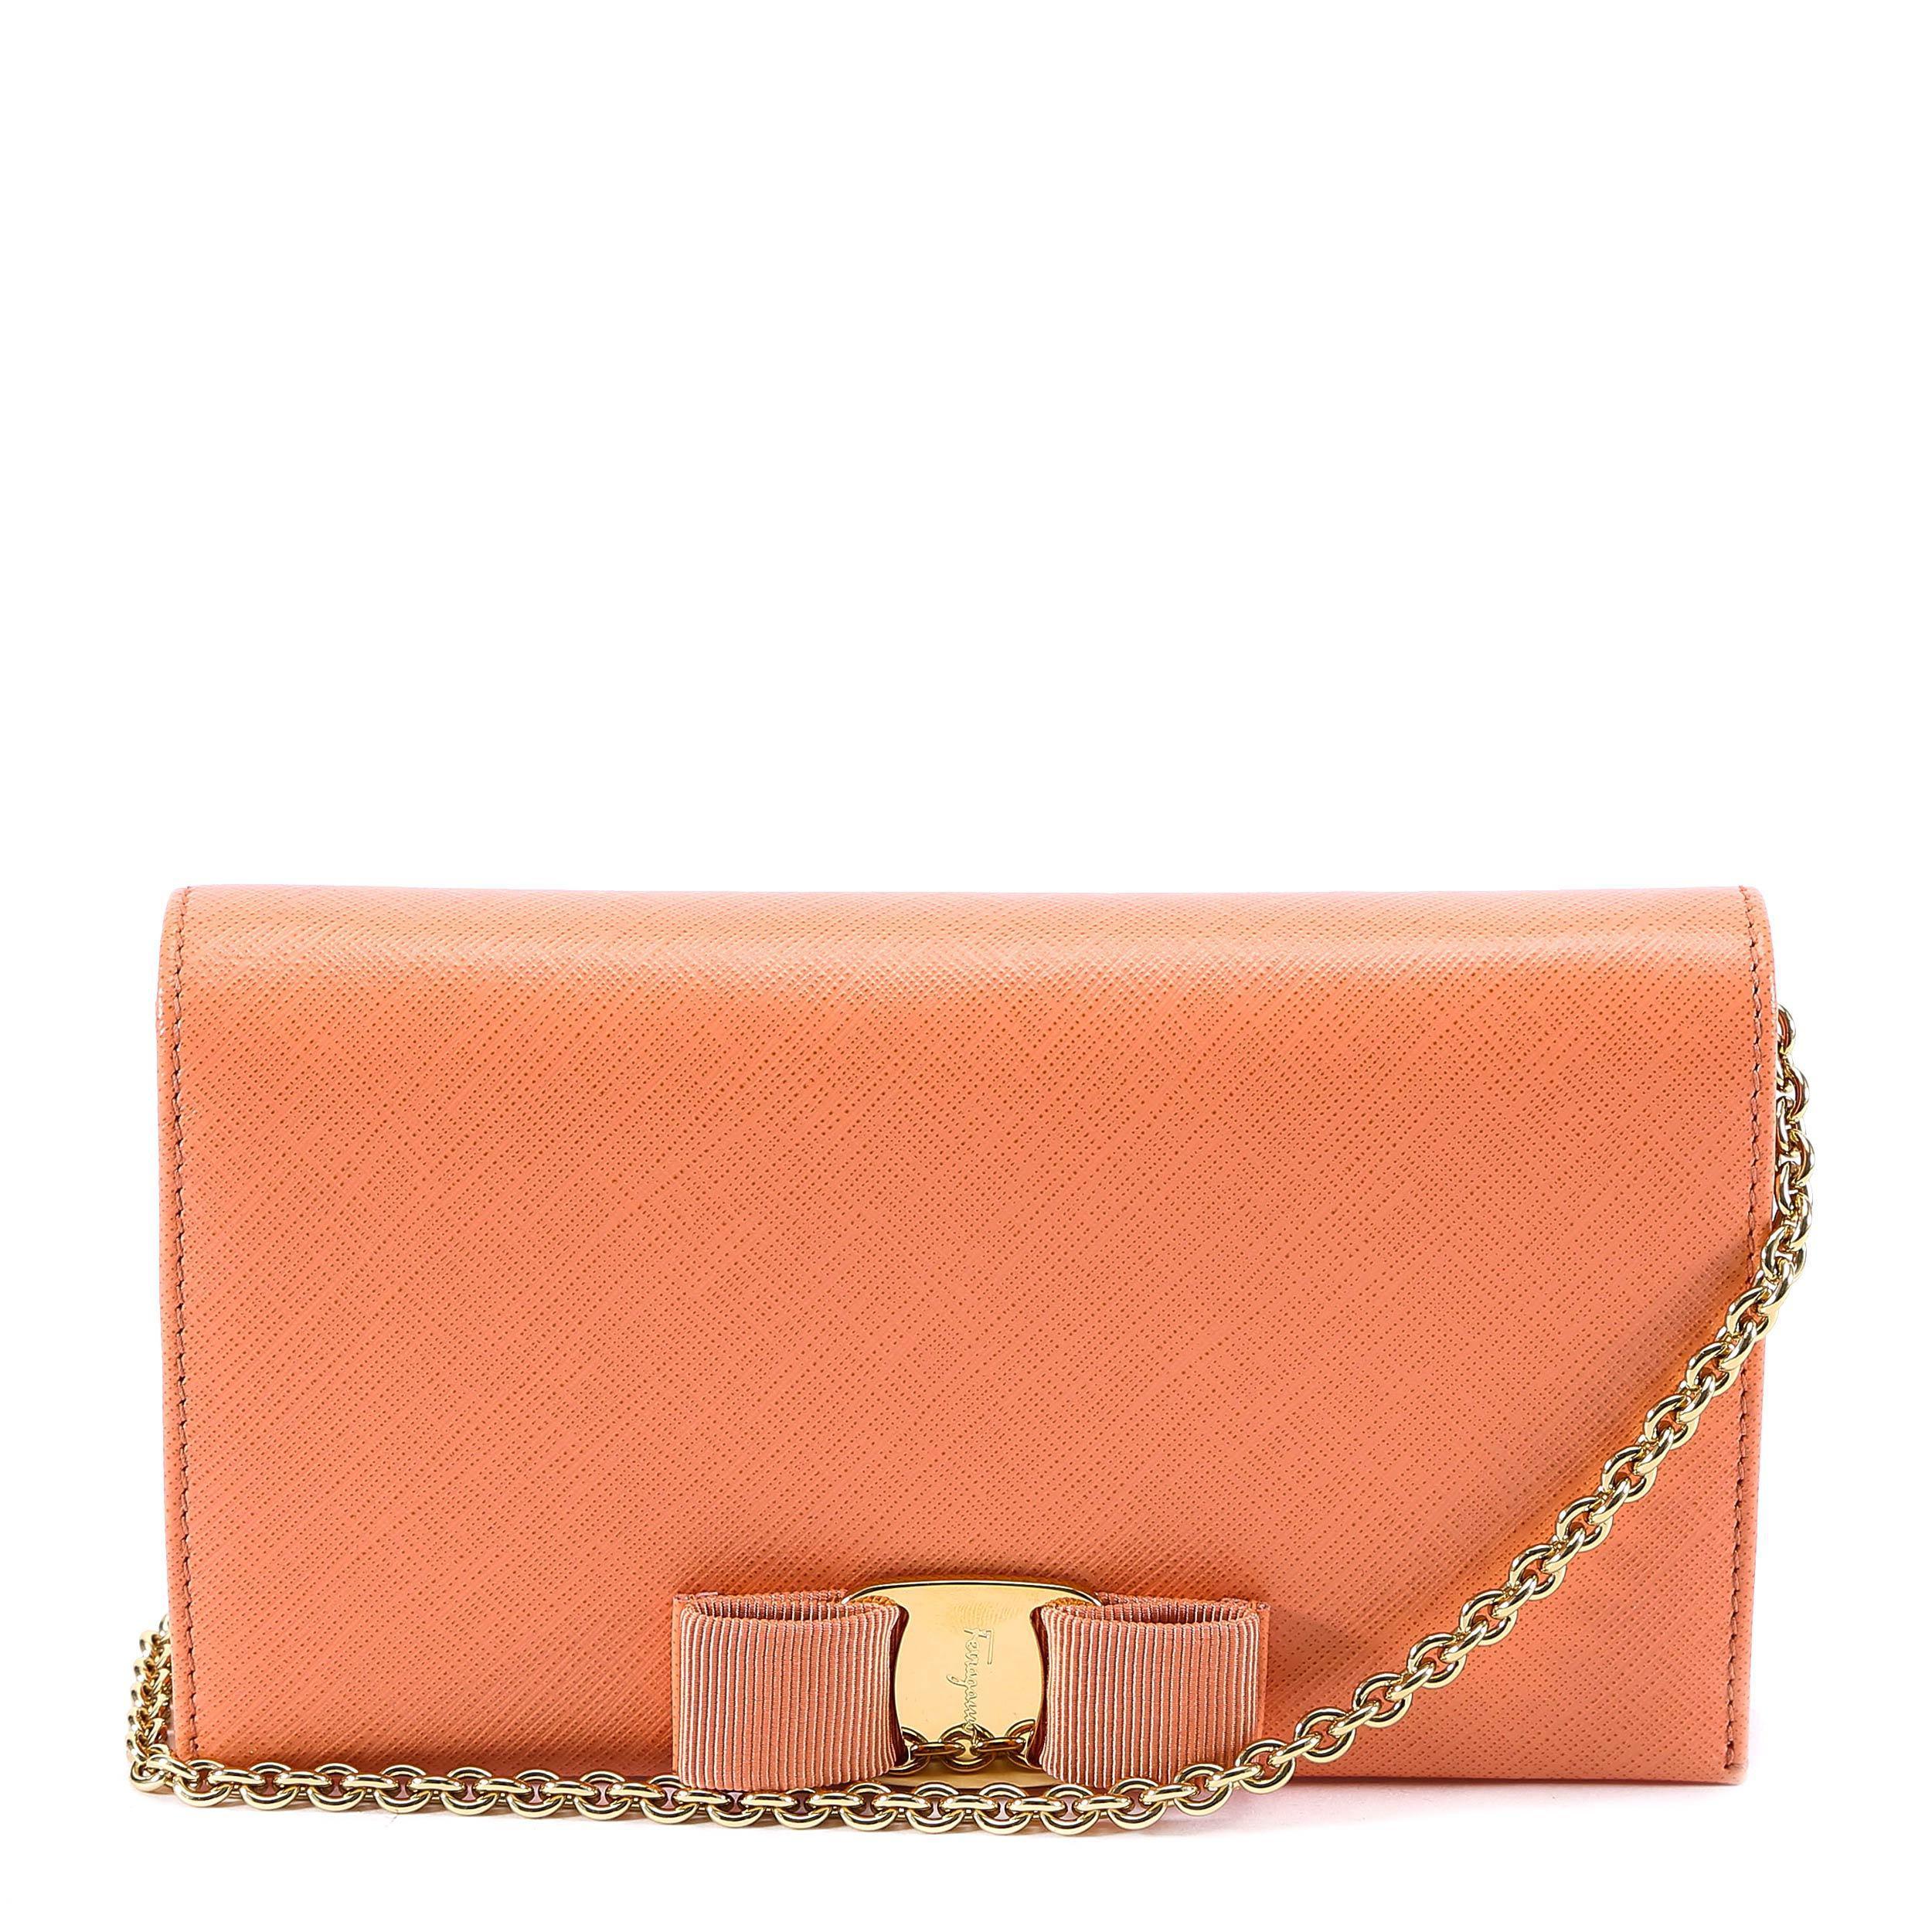 35e599b6f31d Ferragamo Vara Wallet On Chain in Orange - Lyst